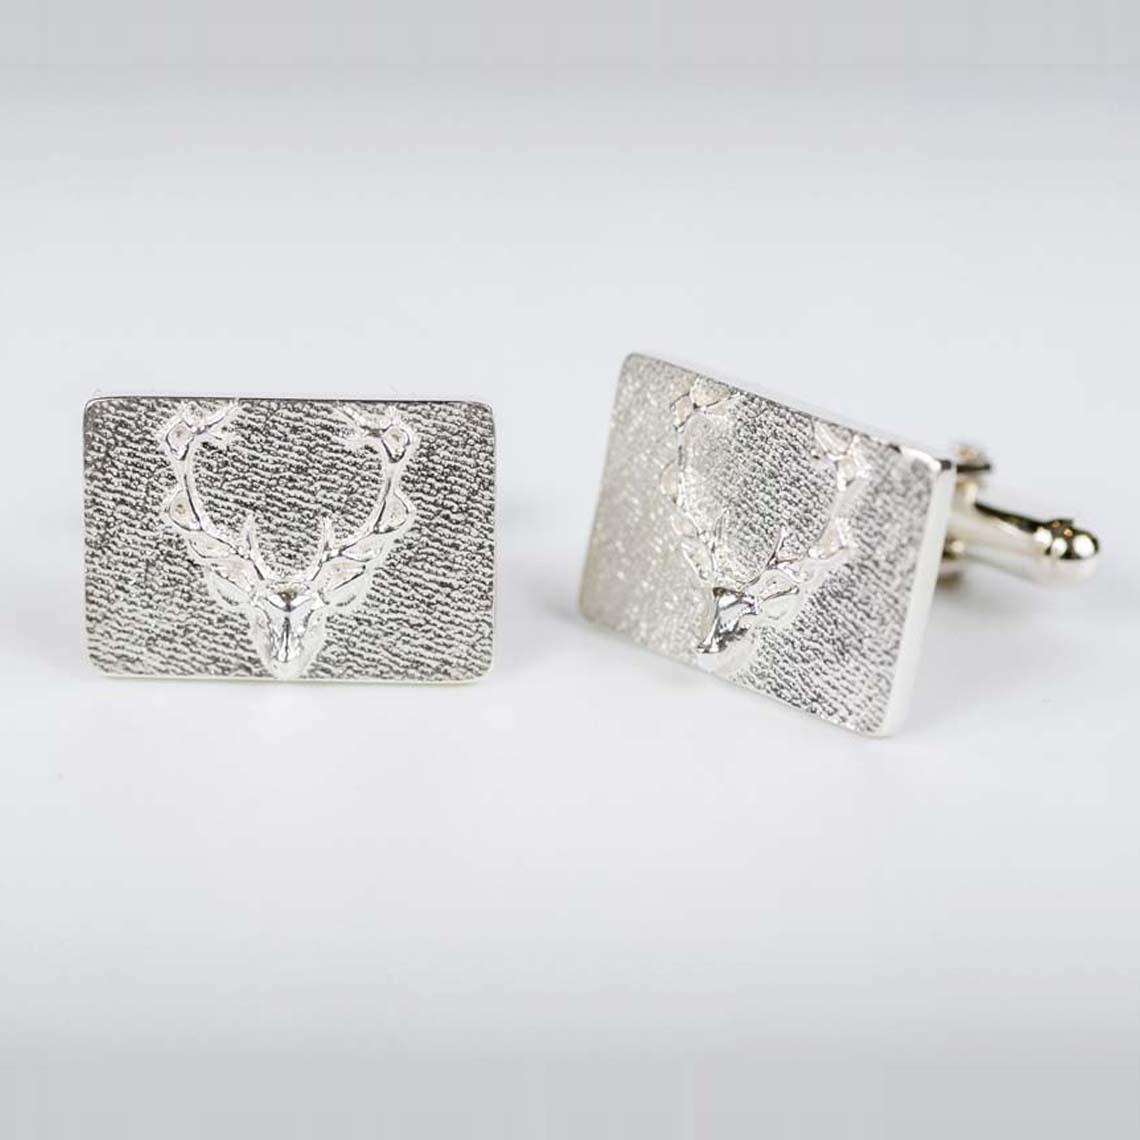 Silver Stag Cufflinks